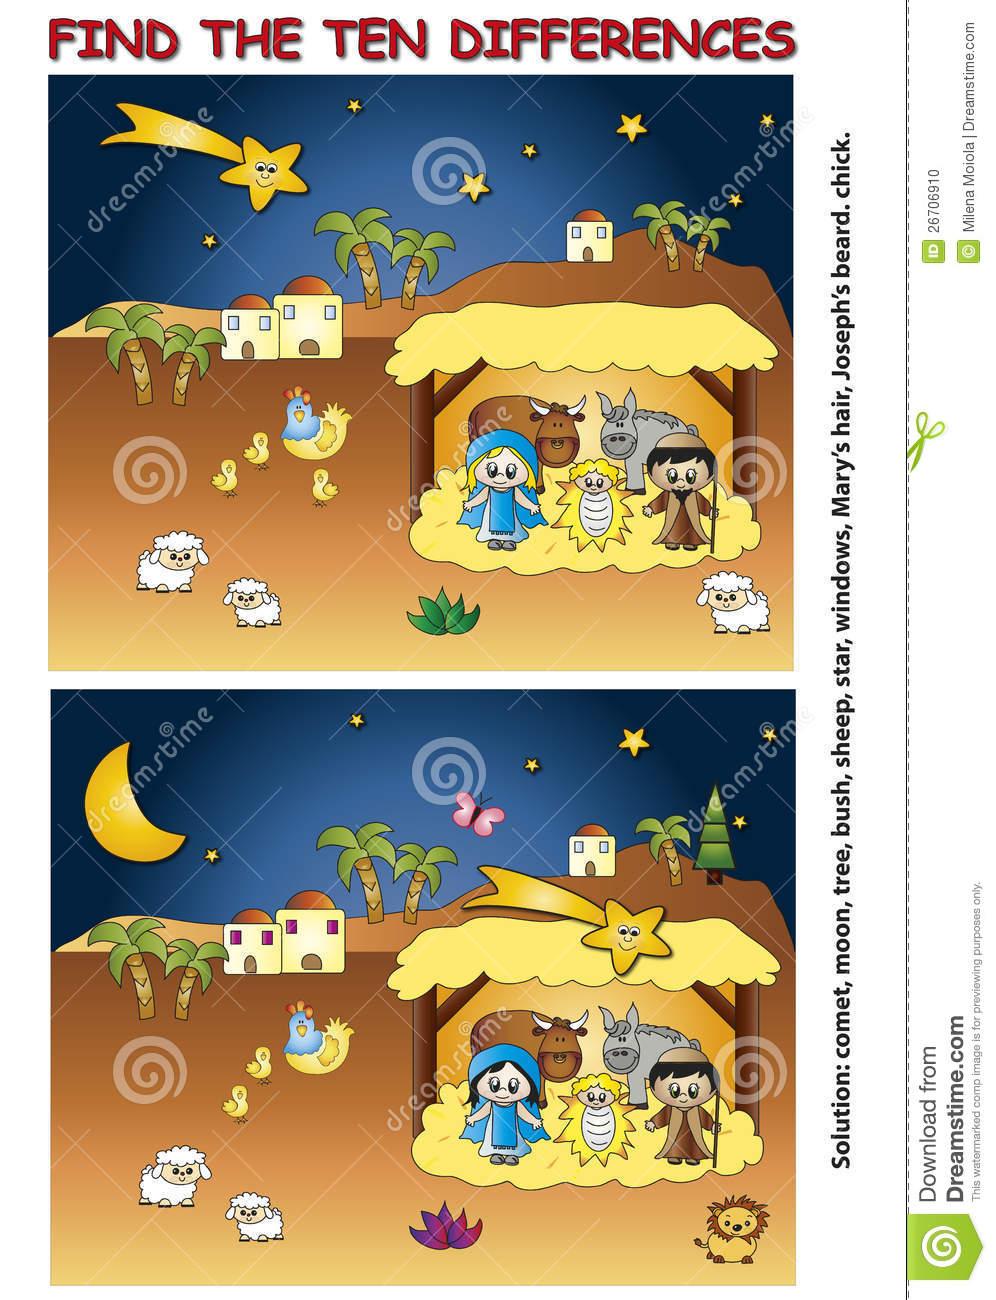 Trouvez La Différence Illustration Stock. Illustration Du concernant Trouver La Différence